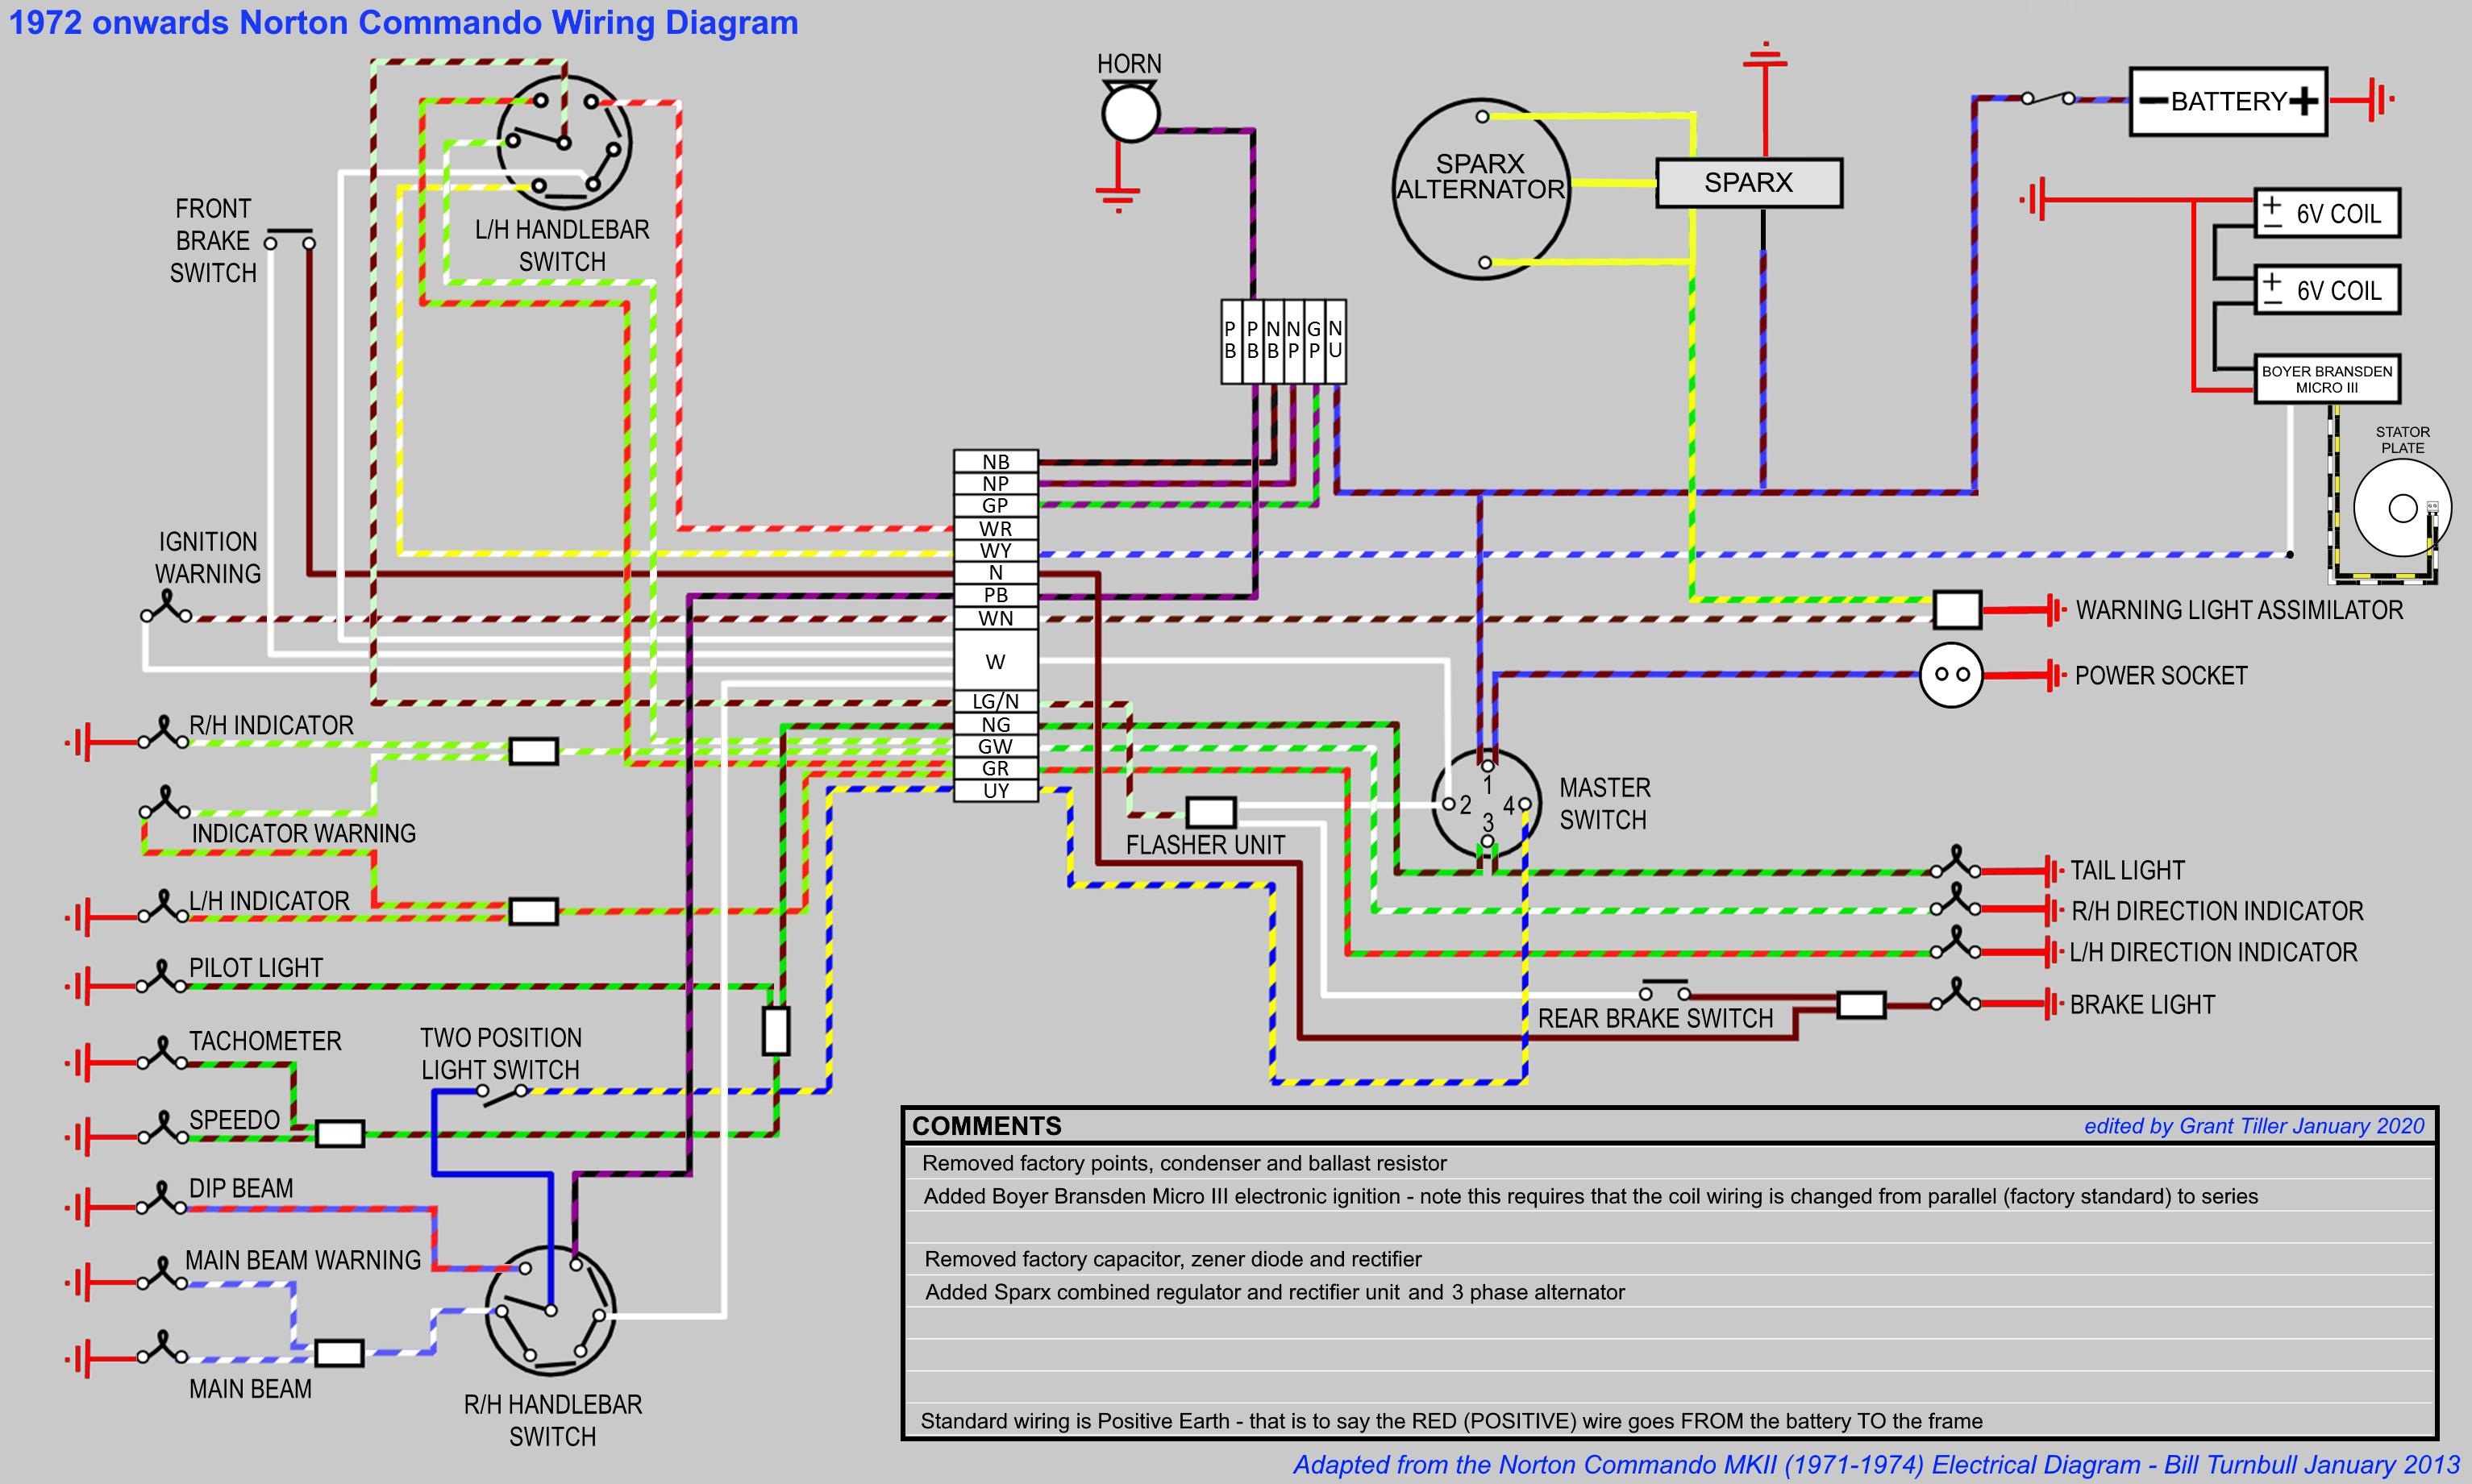 Sparx Wiring Diagram For Lights - 2000 Corvette Wiring Diagrams -  hazzardzz.tukune.jeanjaures37.fr | Sparx Wiring Diagram For Lights |  | Wiring Diagram Resource